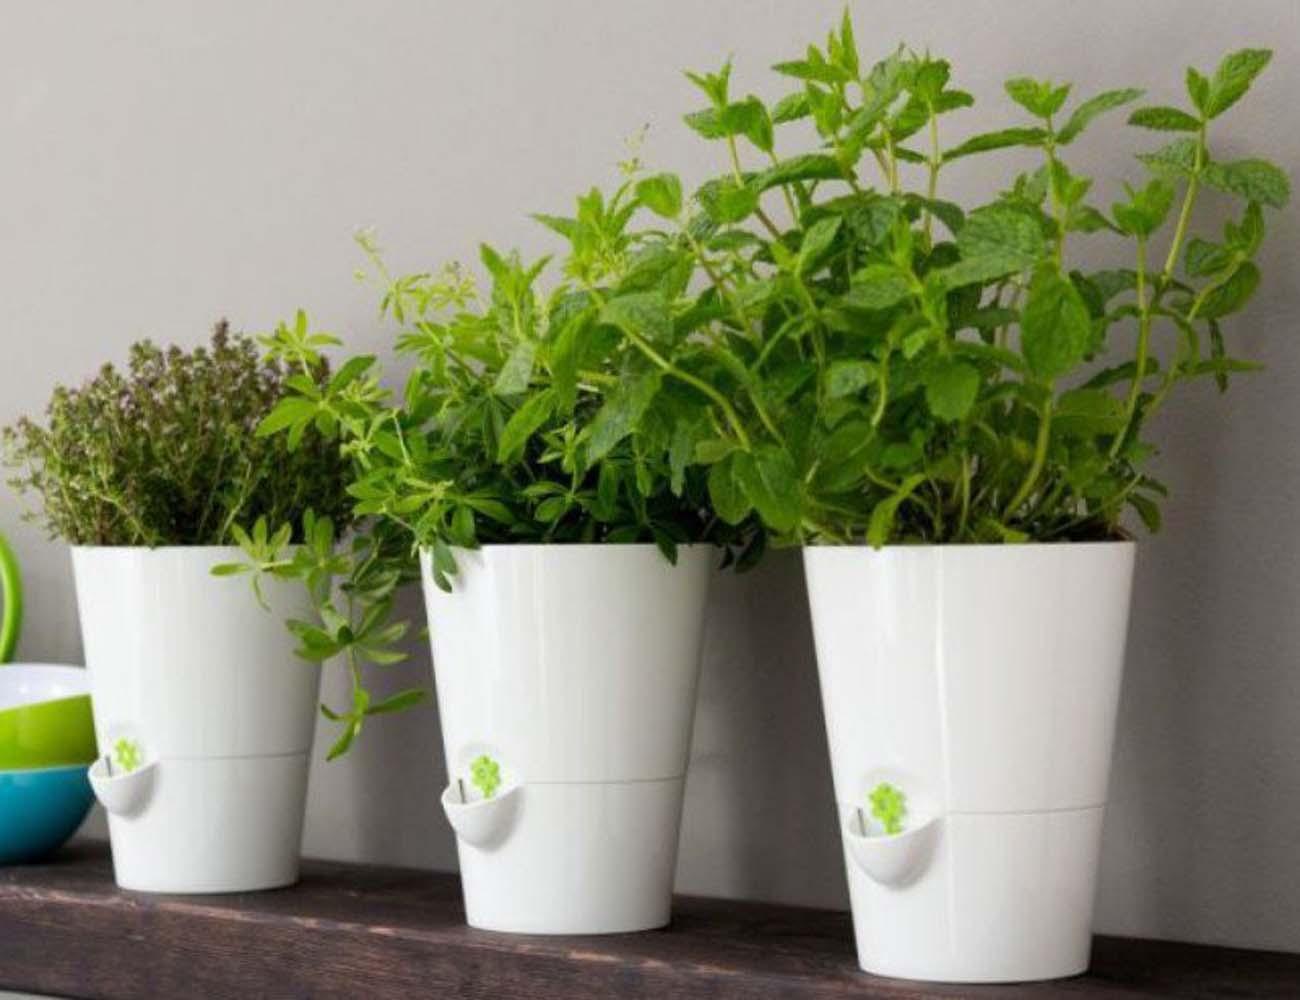 Smart Planter – Designed for Kitchen Herbs